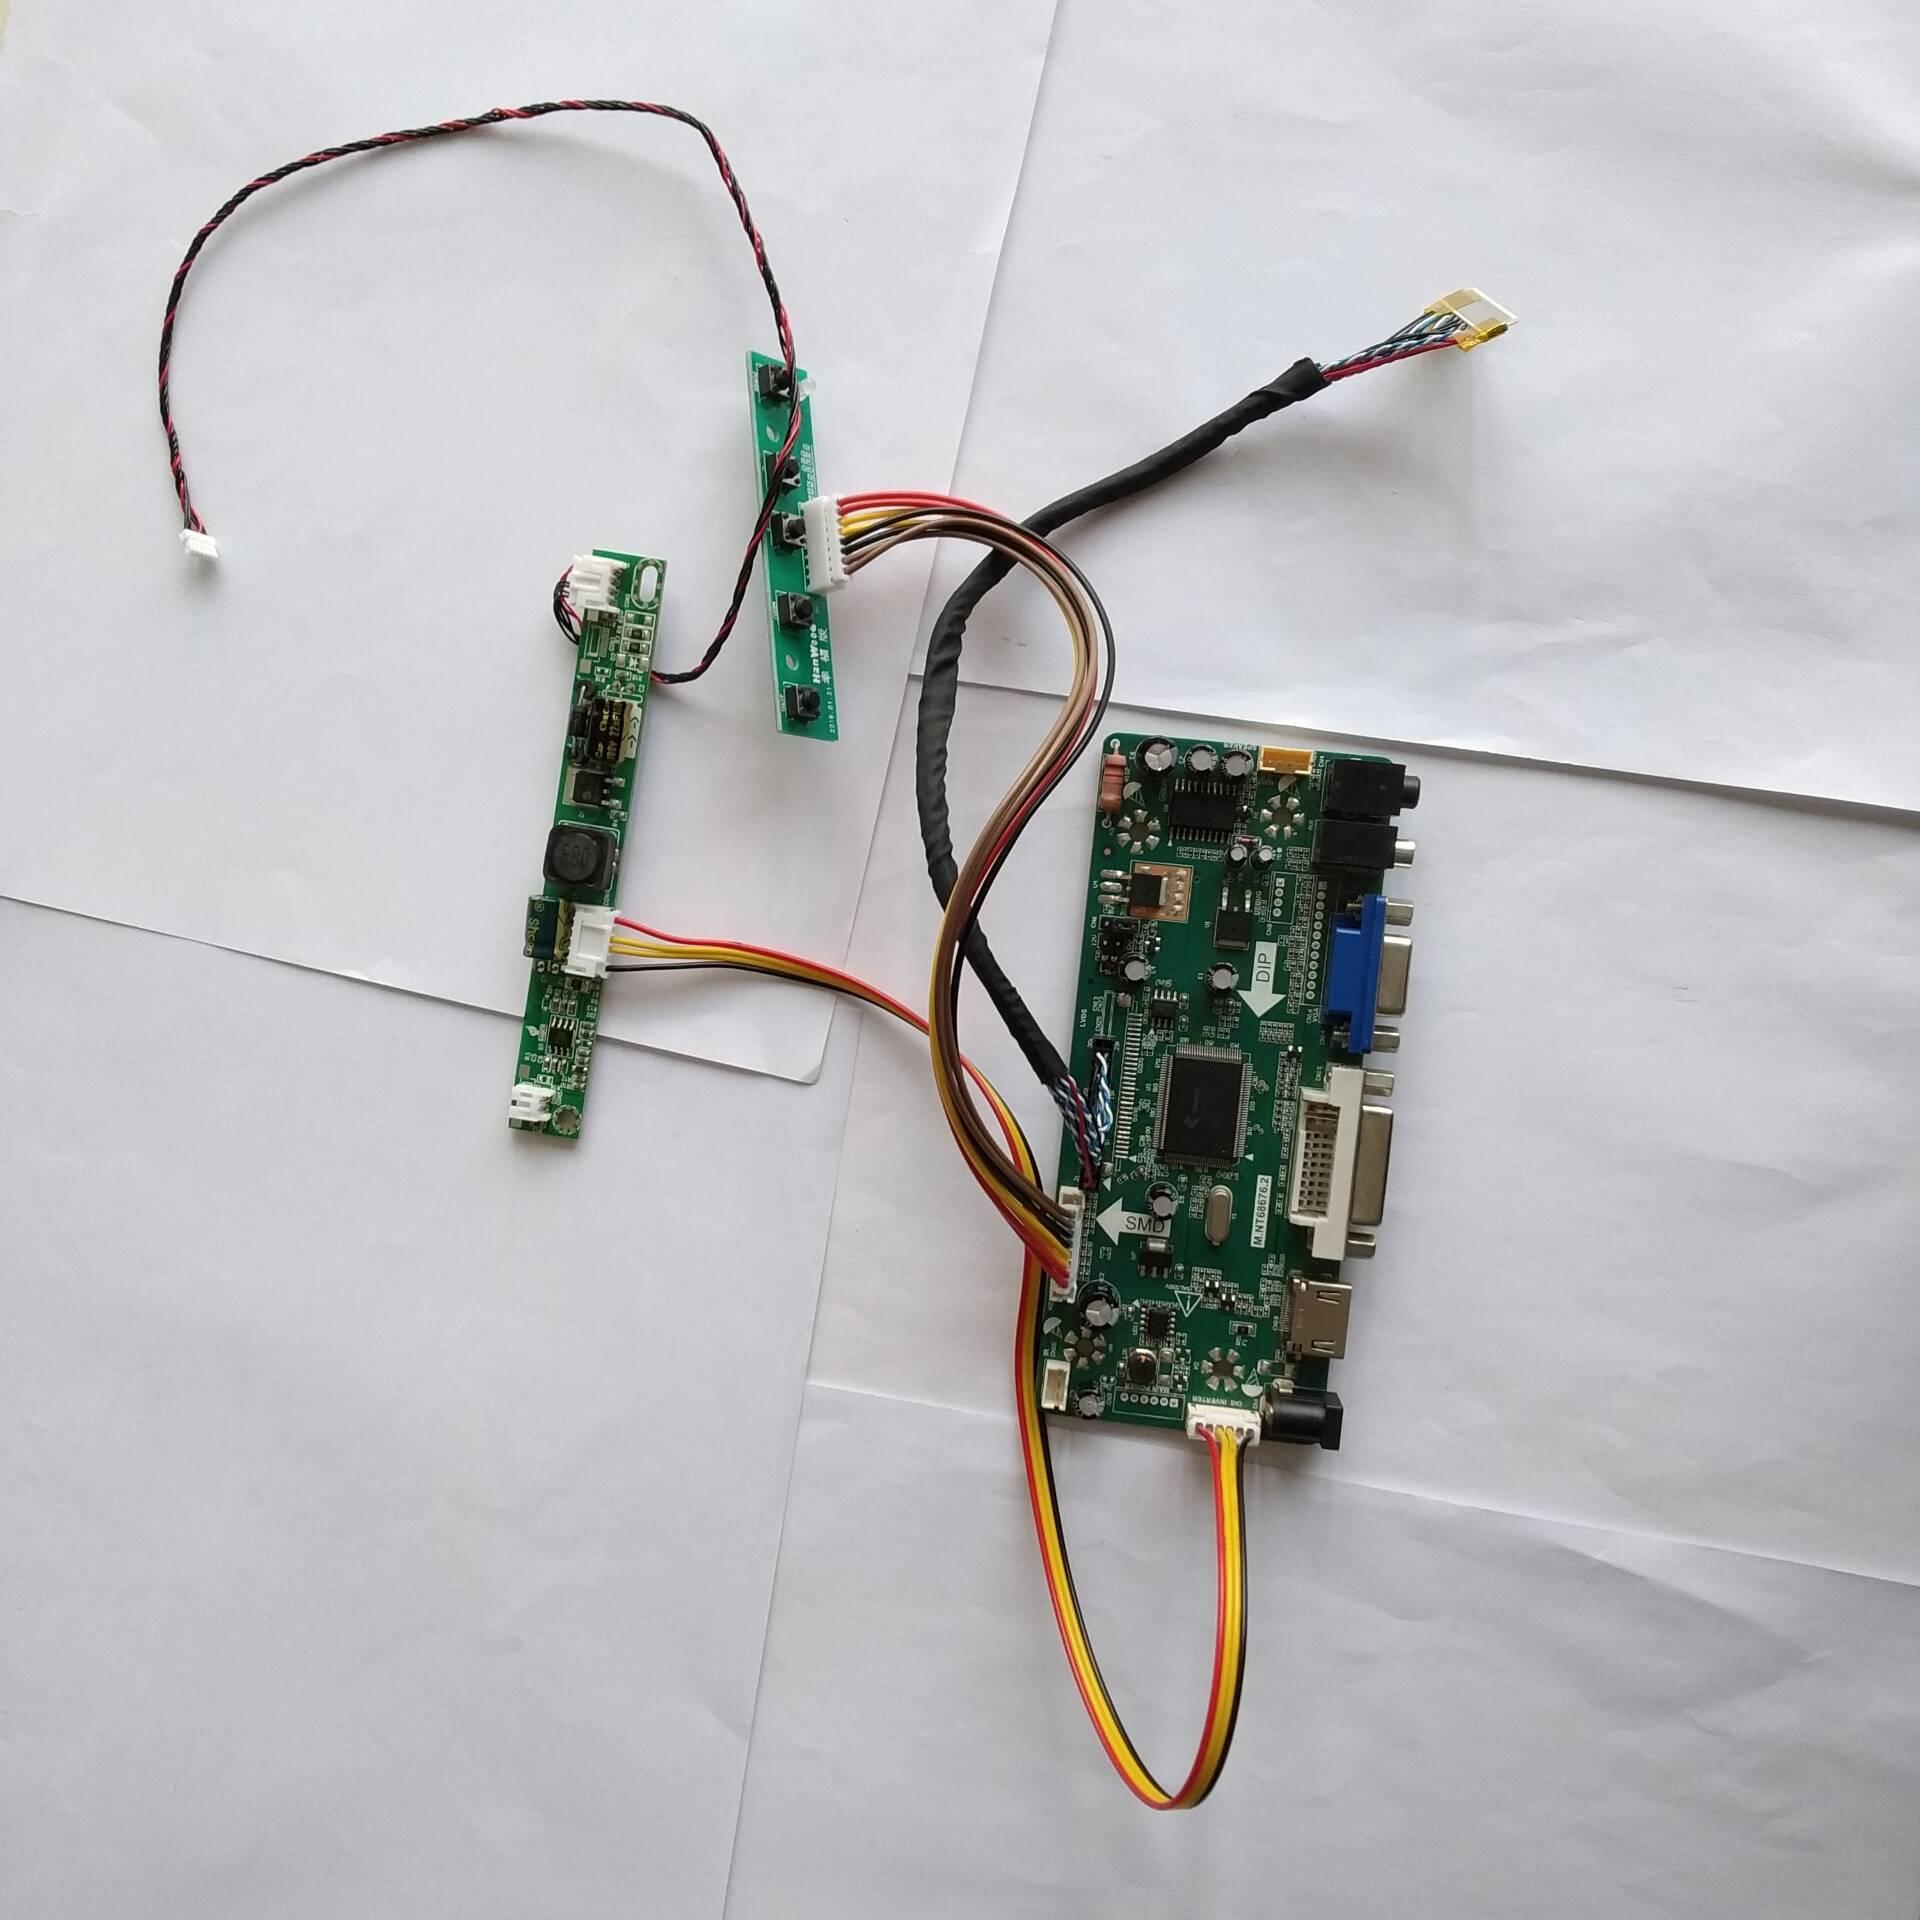 M.NT68676 HDMI DVI VGA LED LCD Controller Board Kit For MAC LM215WF3(SL)(A1) /SLA1 1920X1080 21.5